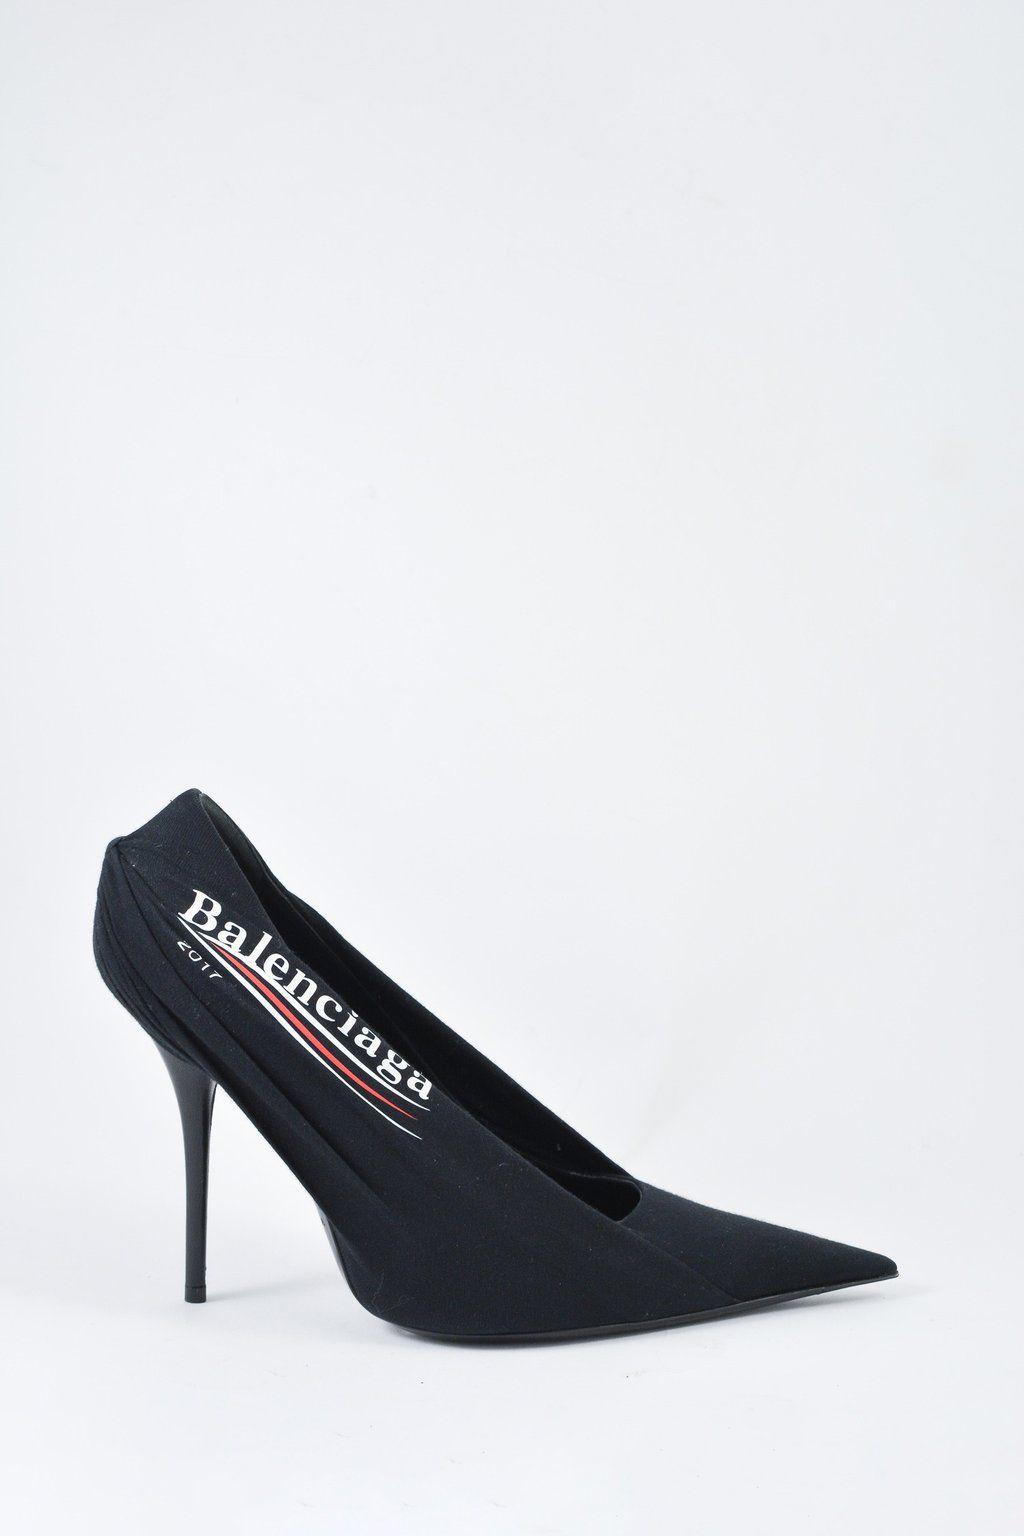 Matching Shoes and Bag Black Ruched Chiffon Satin Peep Toe Slingback 4.5/'/' Heel